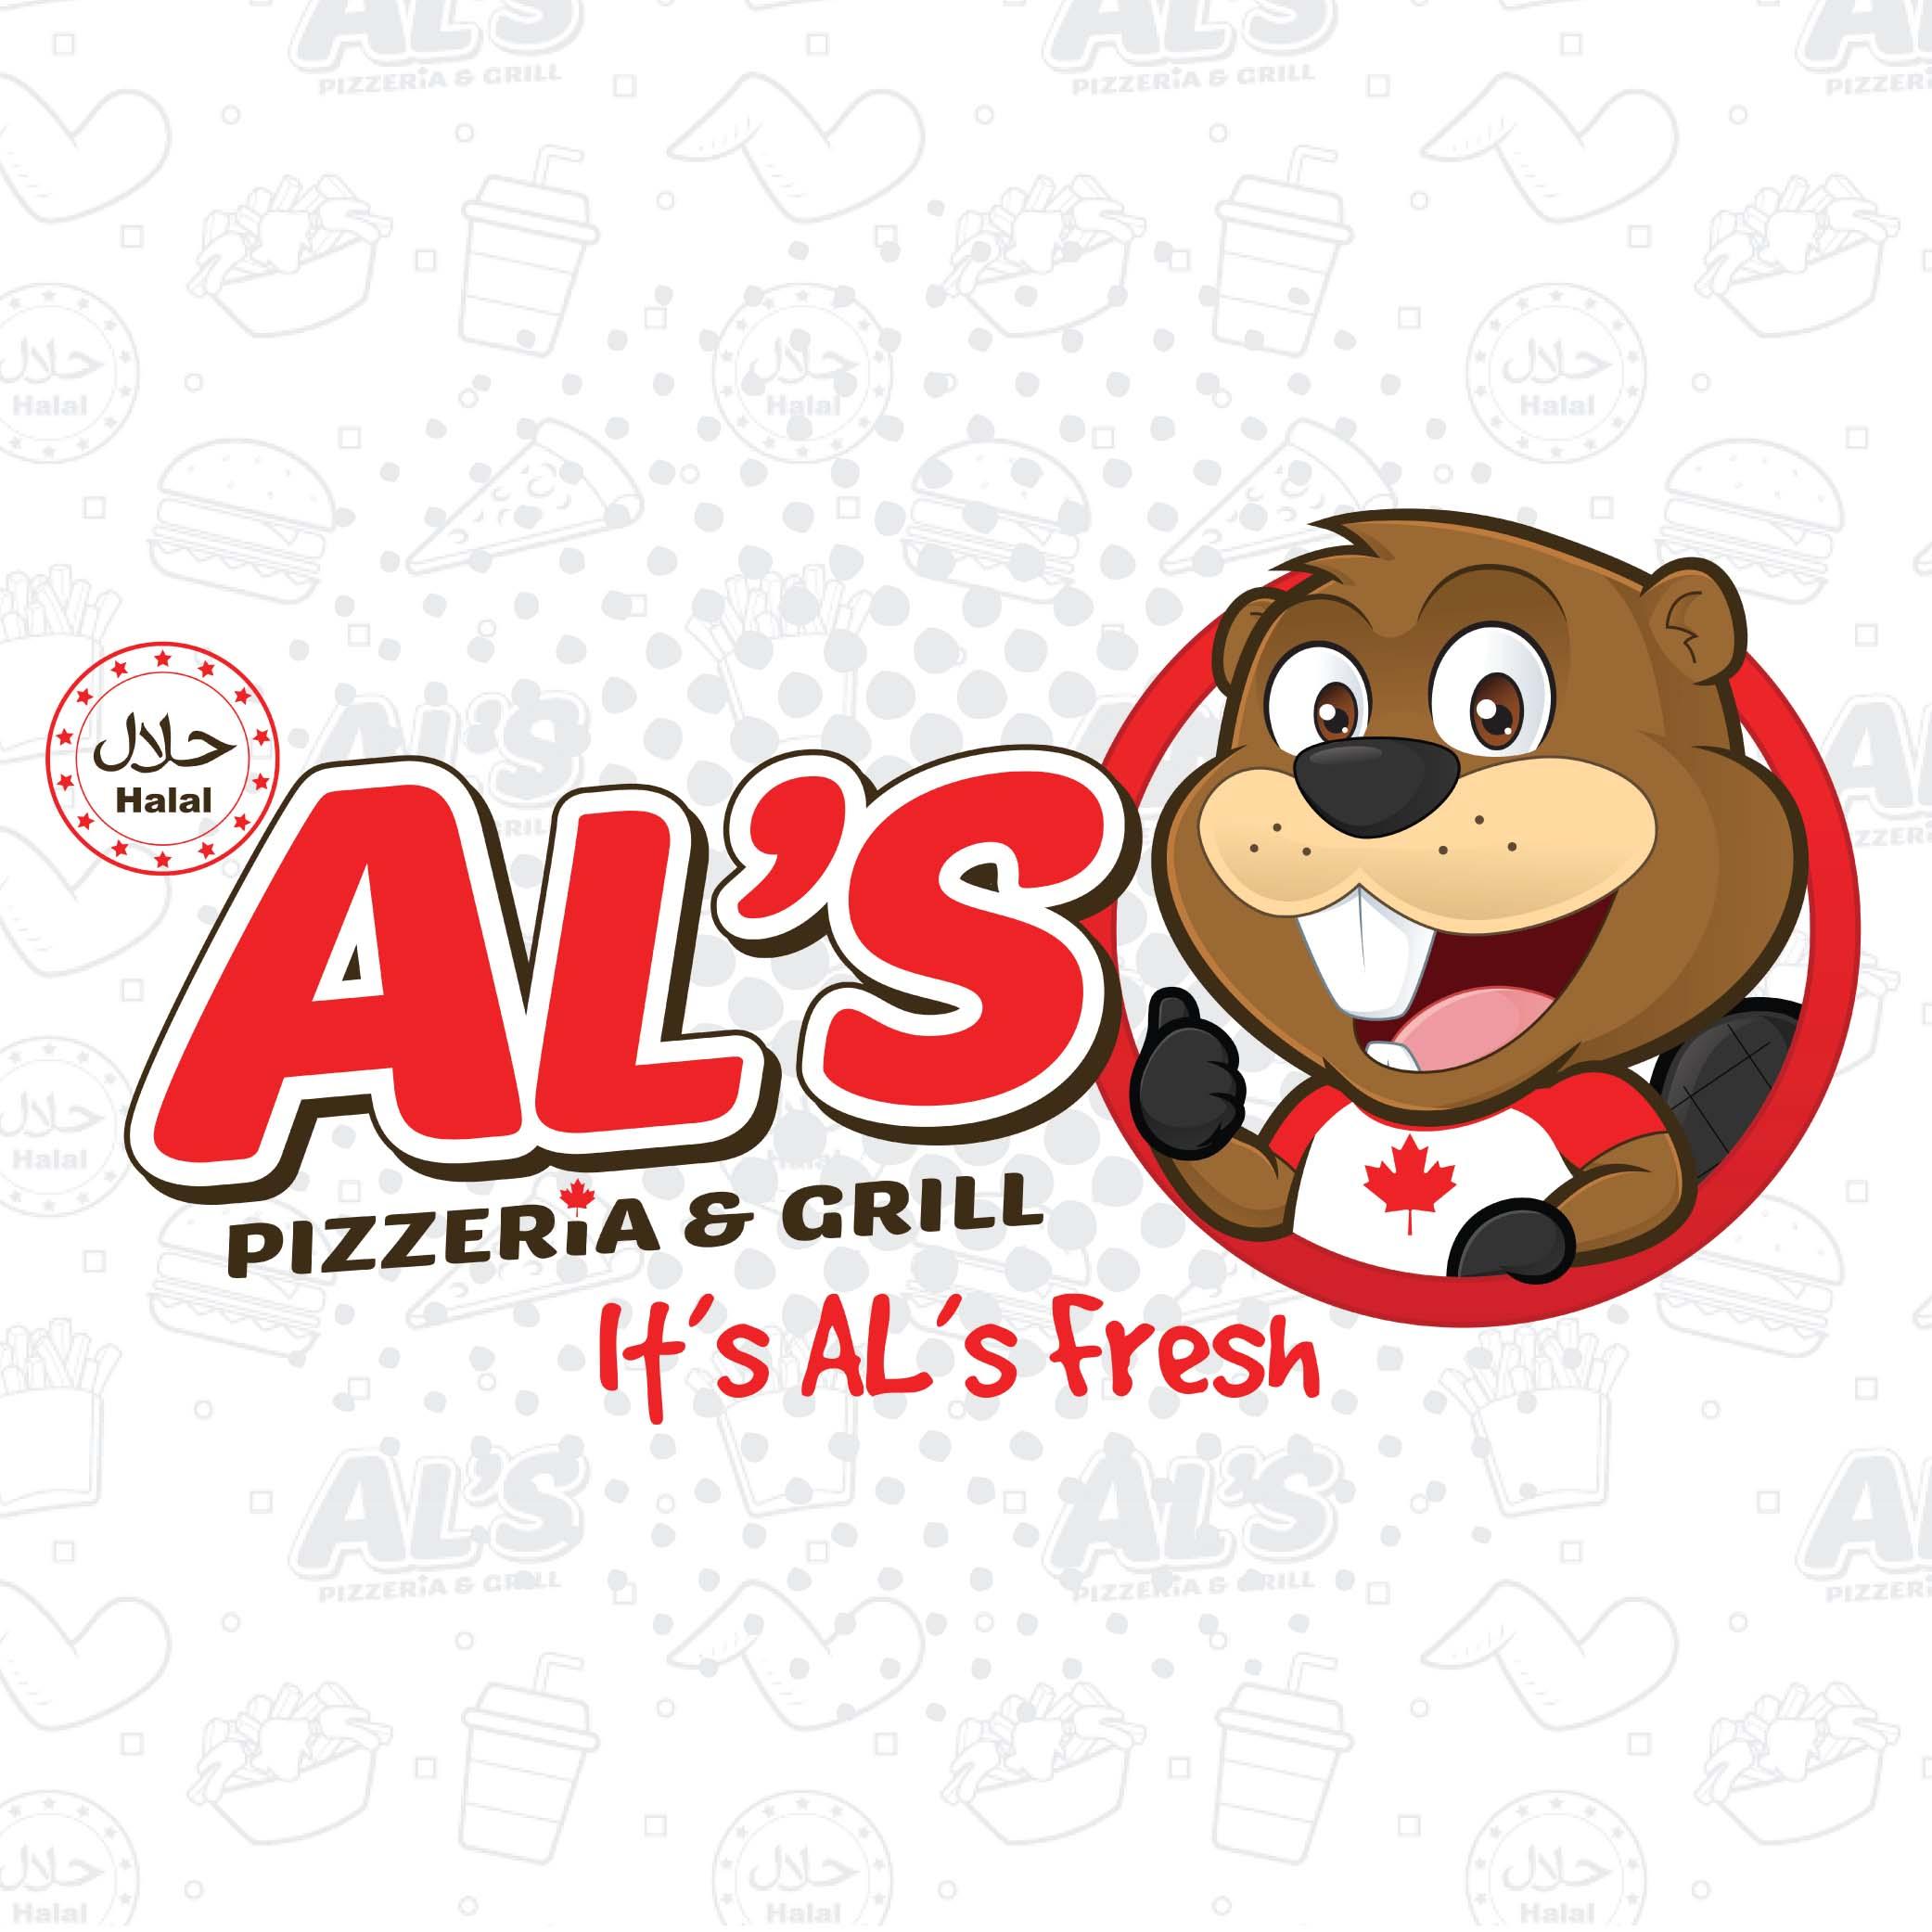 Logo Updated-AL's Pizzeria Grill